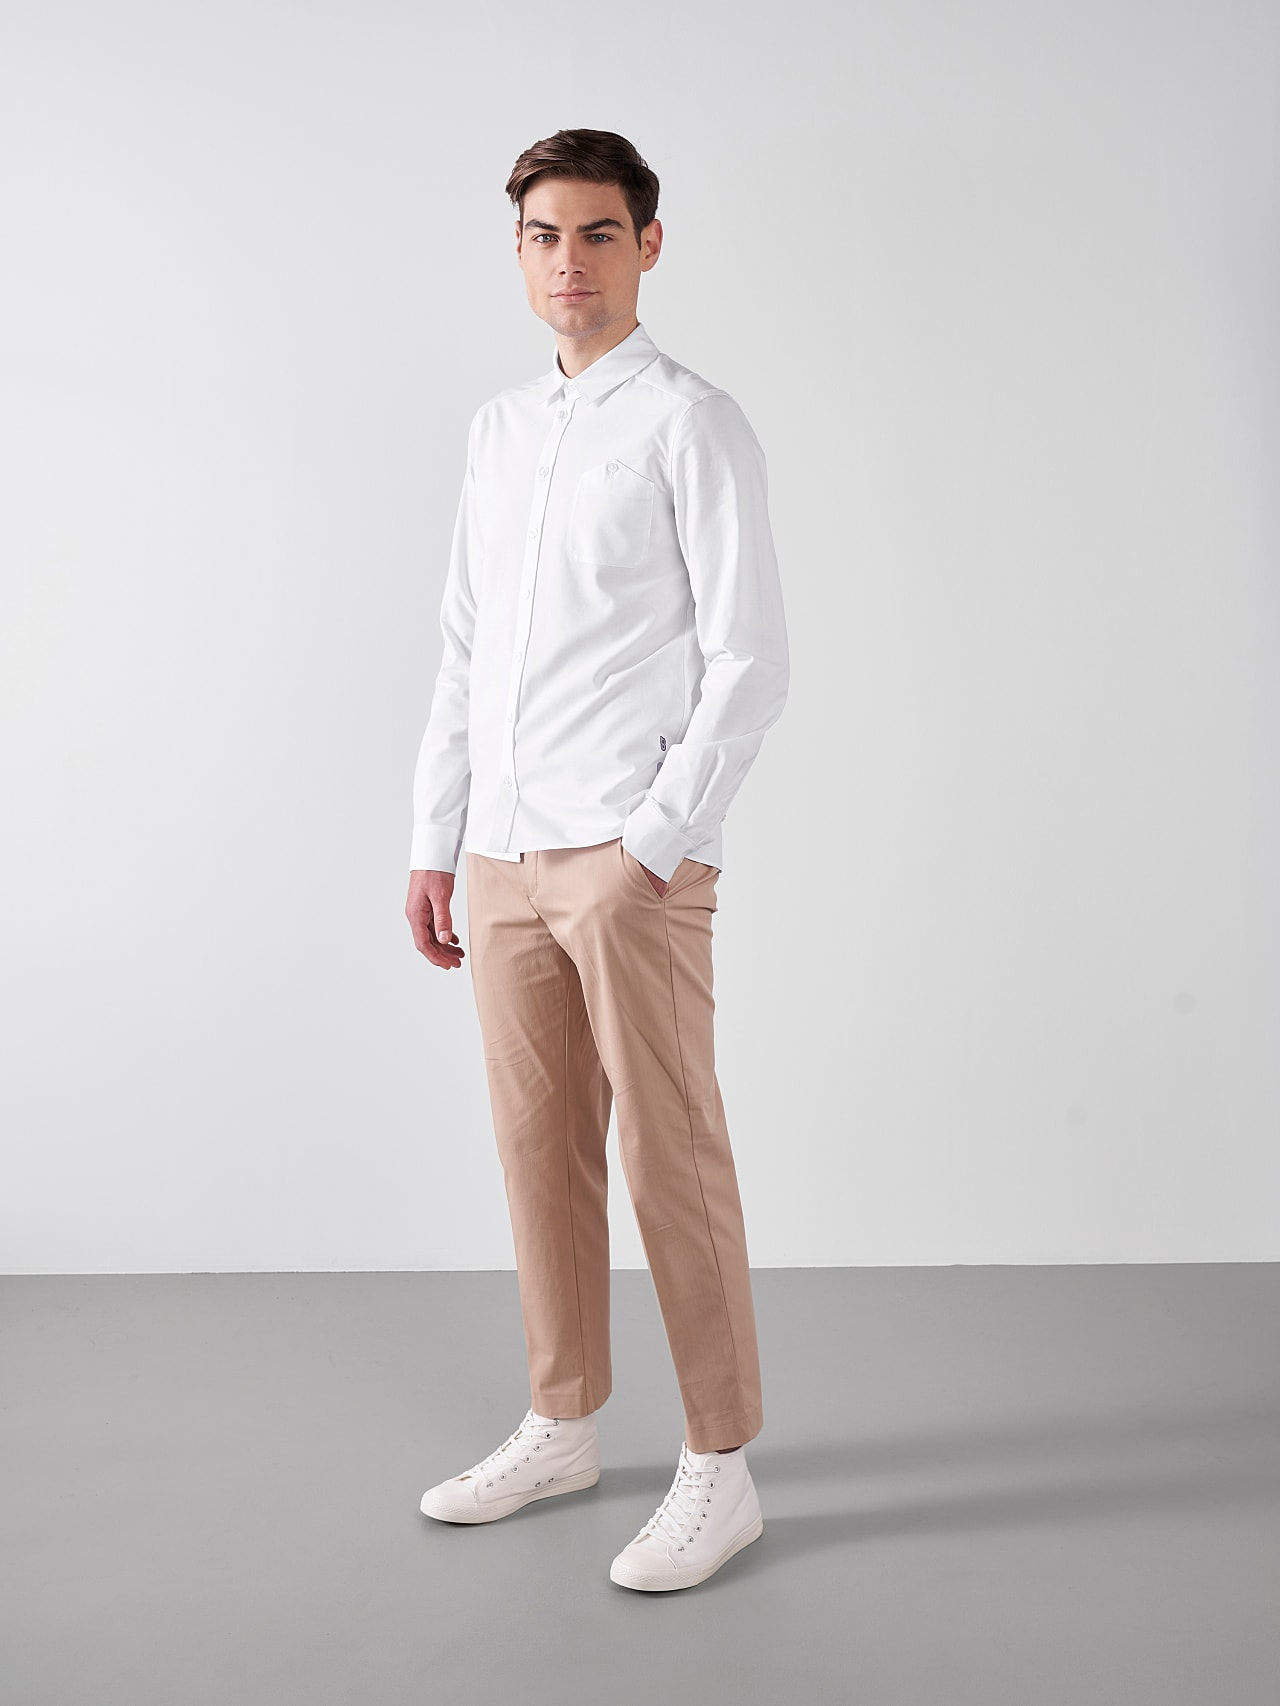 WOSKA V2.Y5.01 Kent Collar Oxford Shirt white Model shot Alpha Tauri